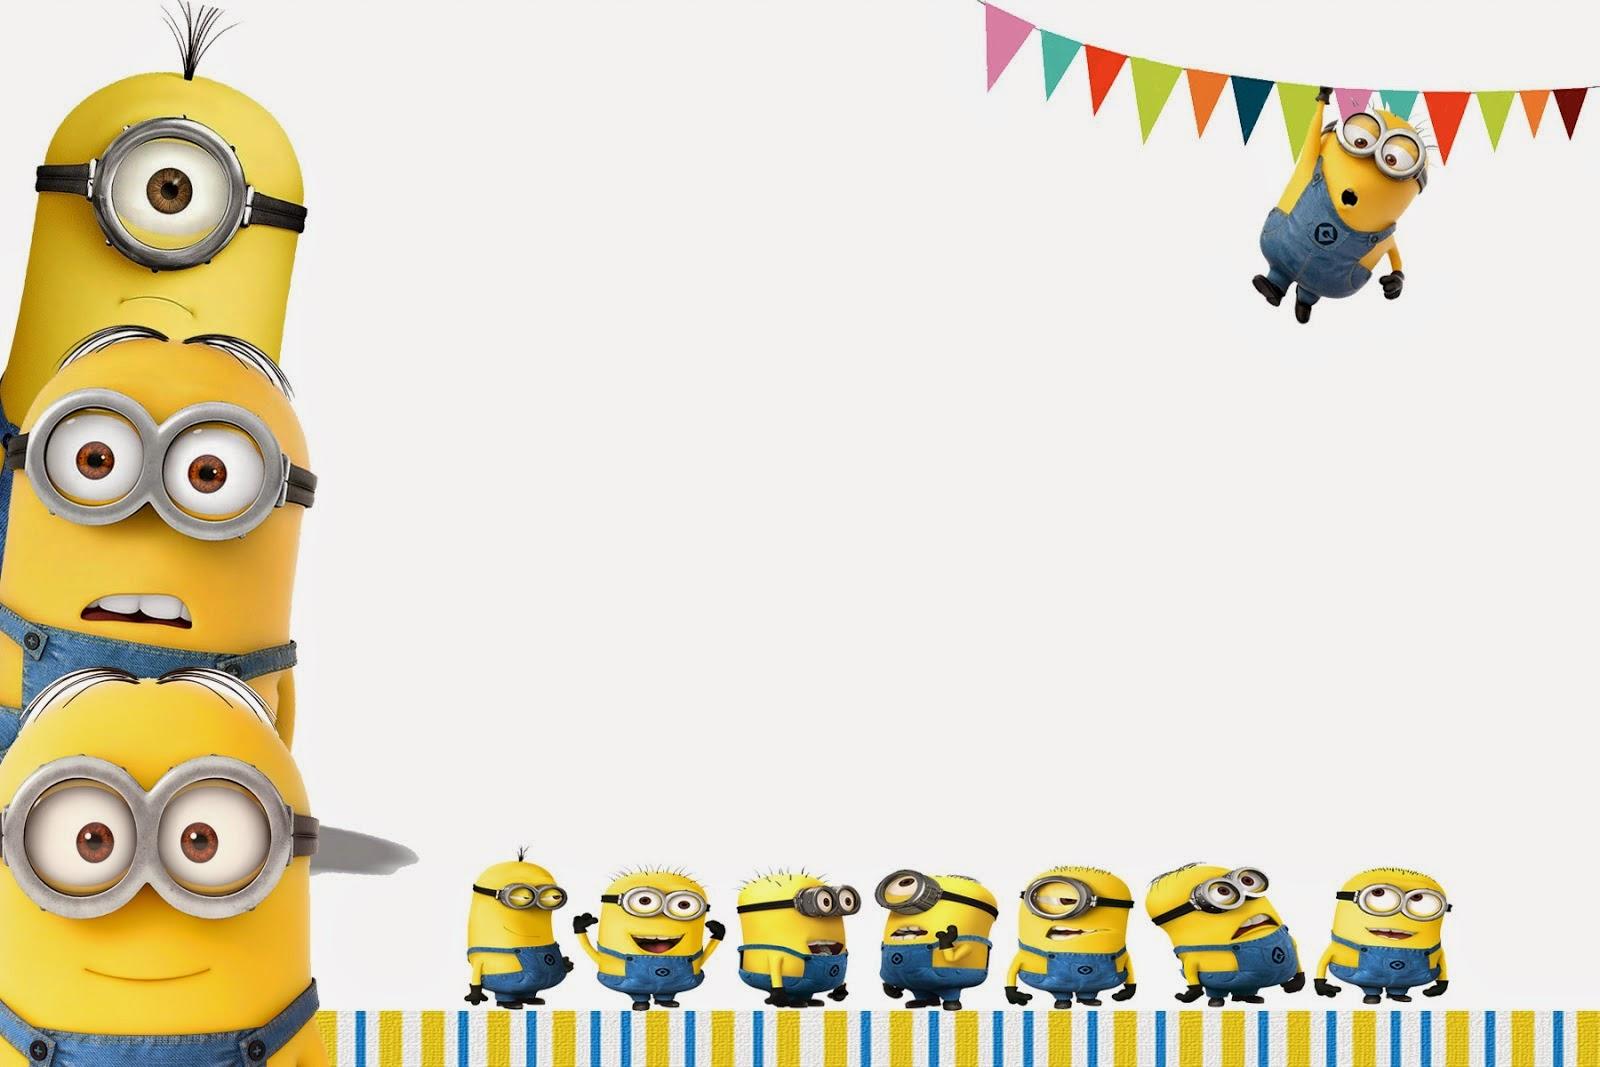 Hungry Caterpillar Invite is amazing invitations design